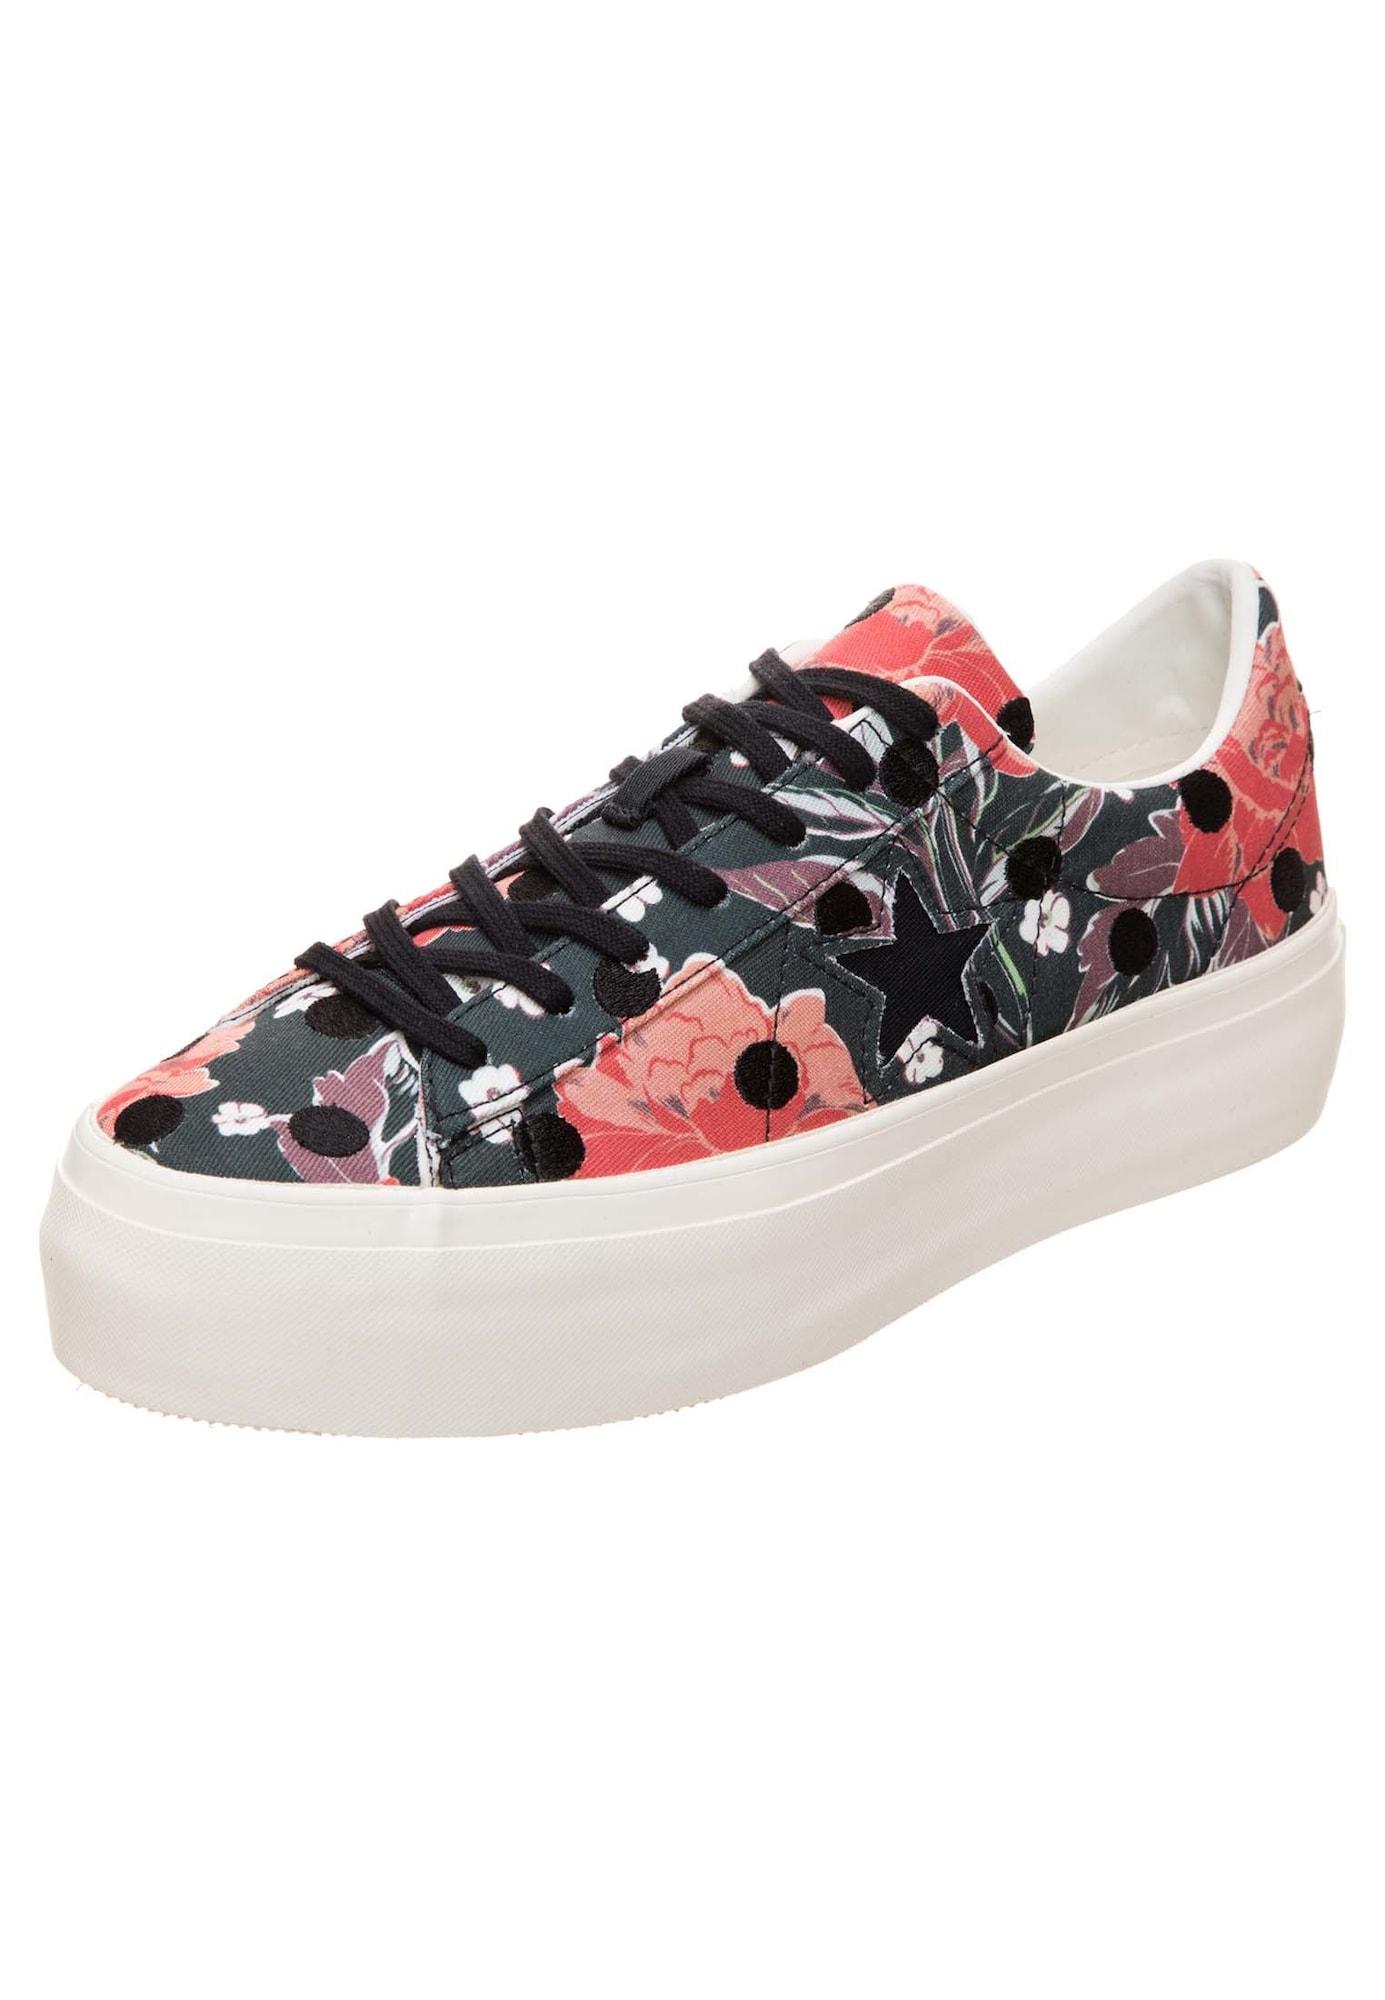 quality design ab331 b8526 Damen CONVERSE Cons One Star Platform OX Sneaker Damen apricot, aprikose,  orange, rot